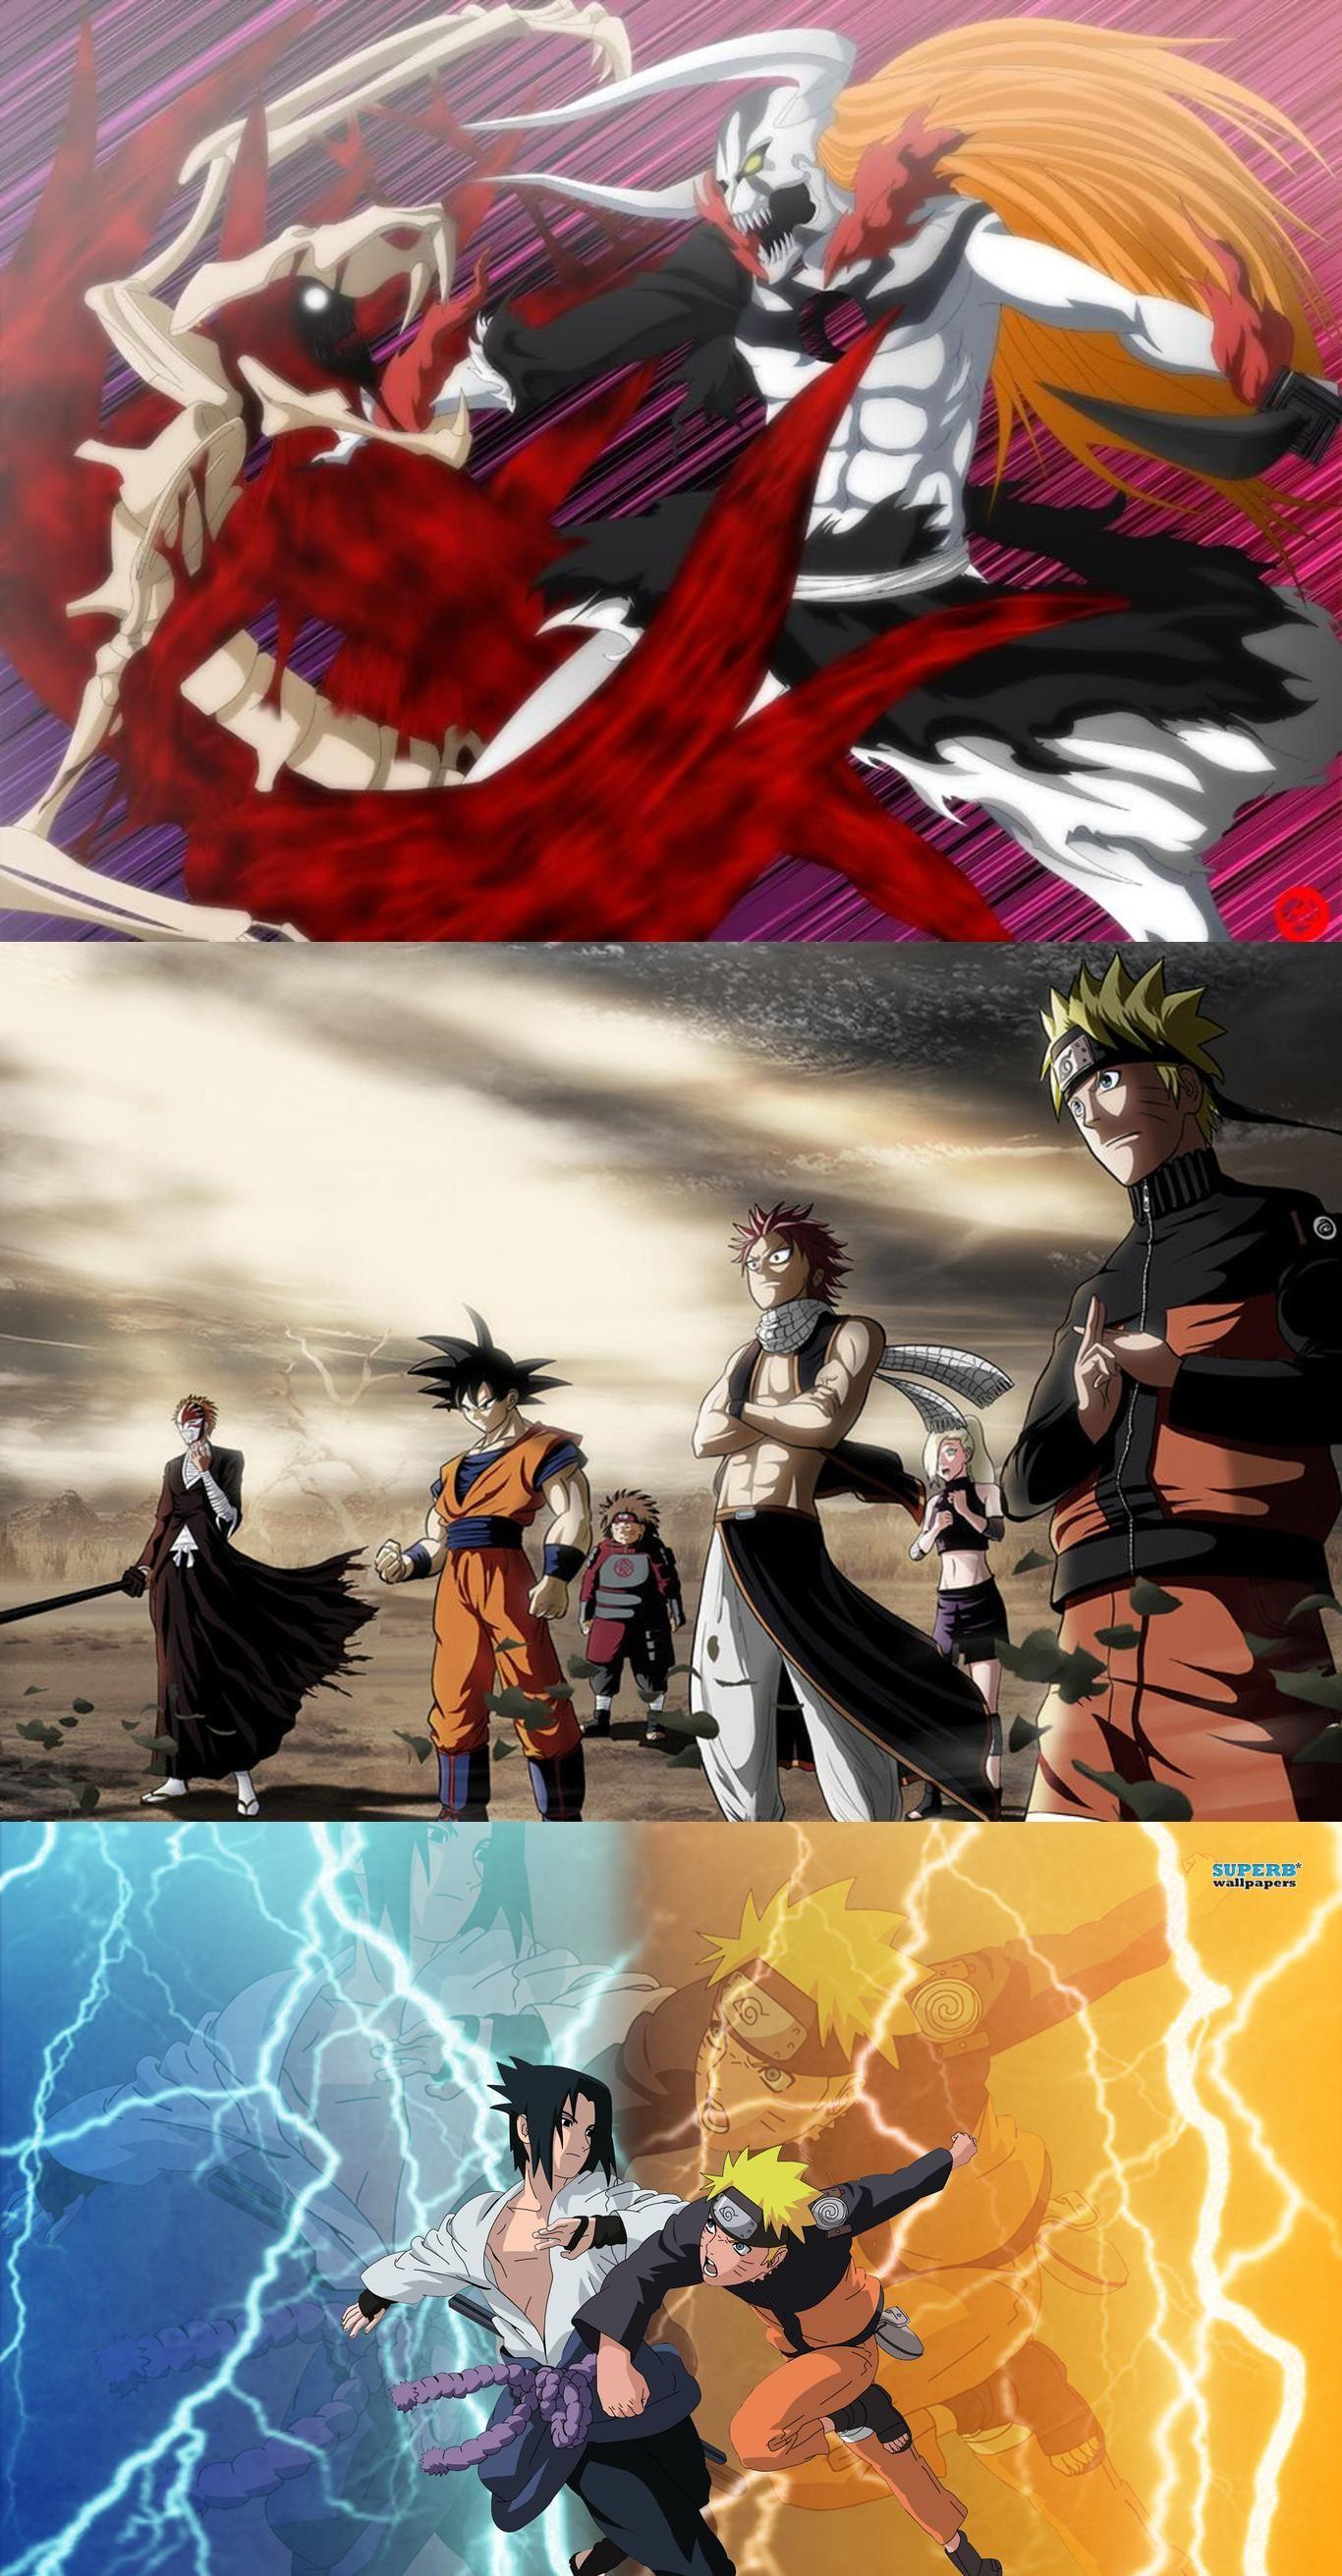 Fantastic Wallpaper Naruto Dbz - 4b1bc9e57c41ec46163647189be38b14  Snapshot_85665.jpg